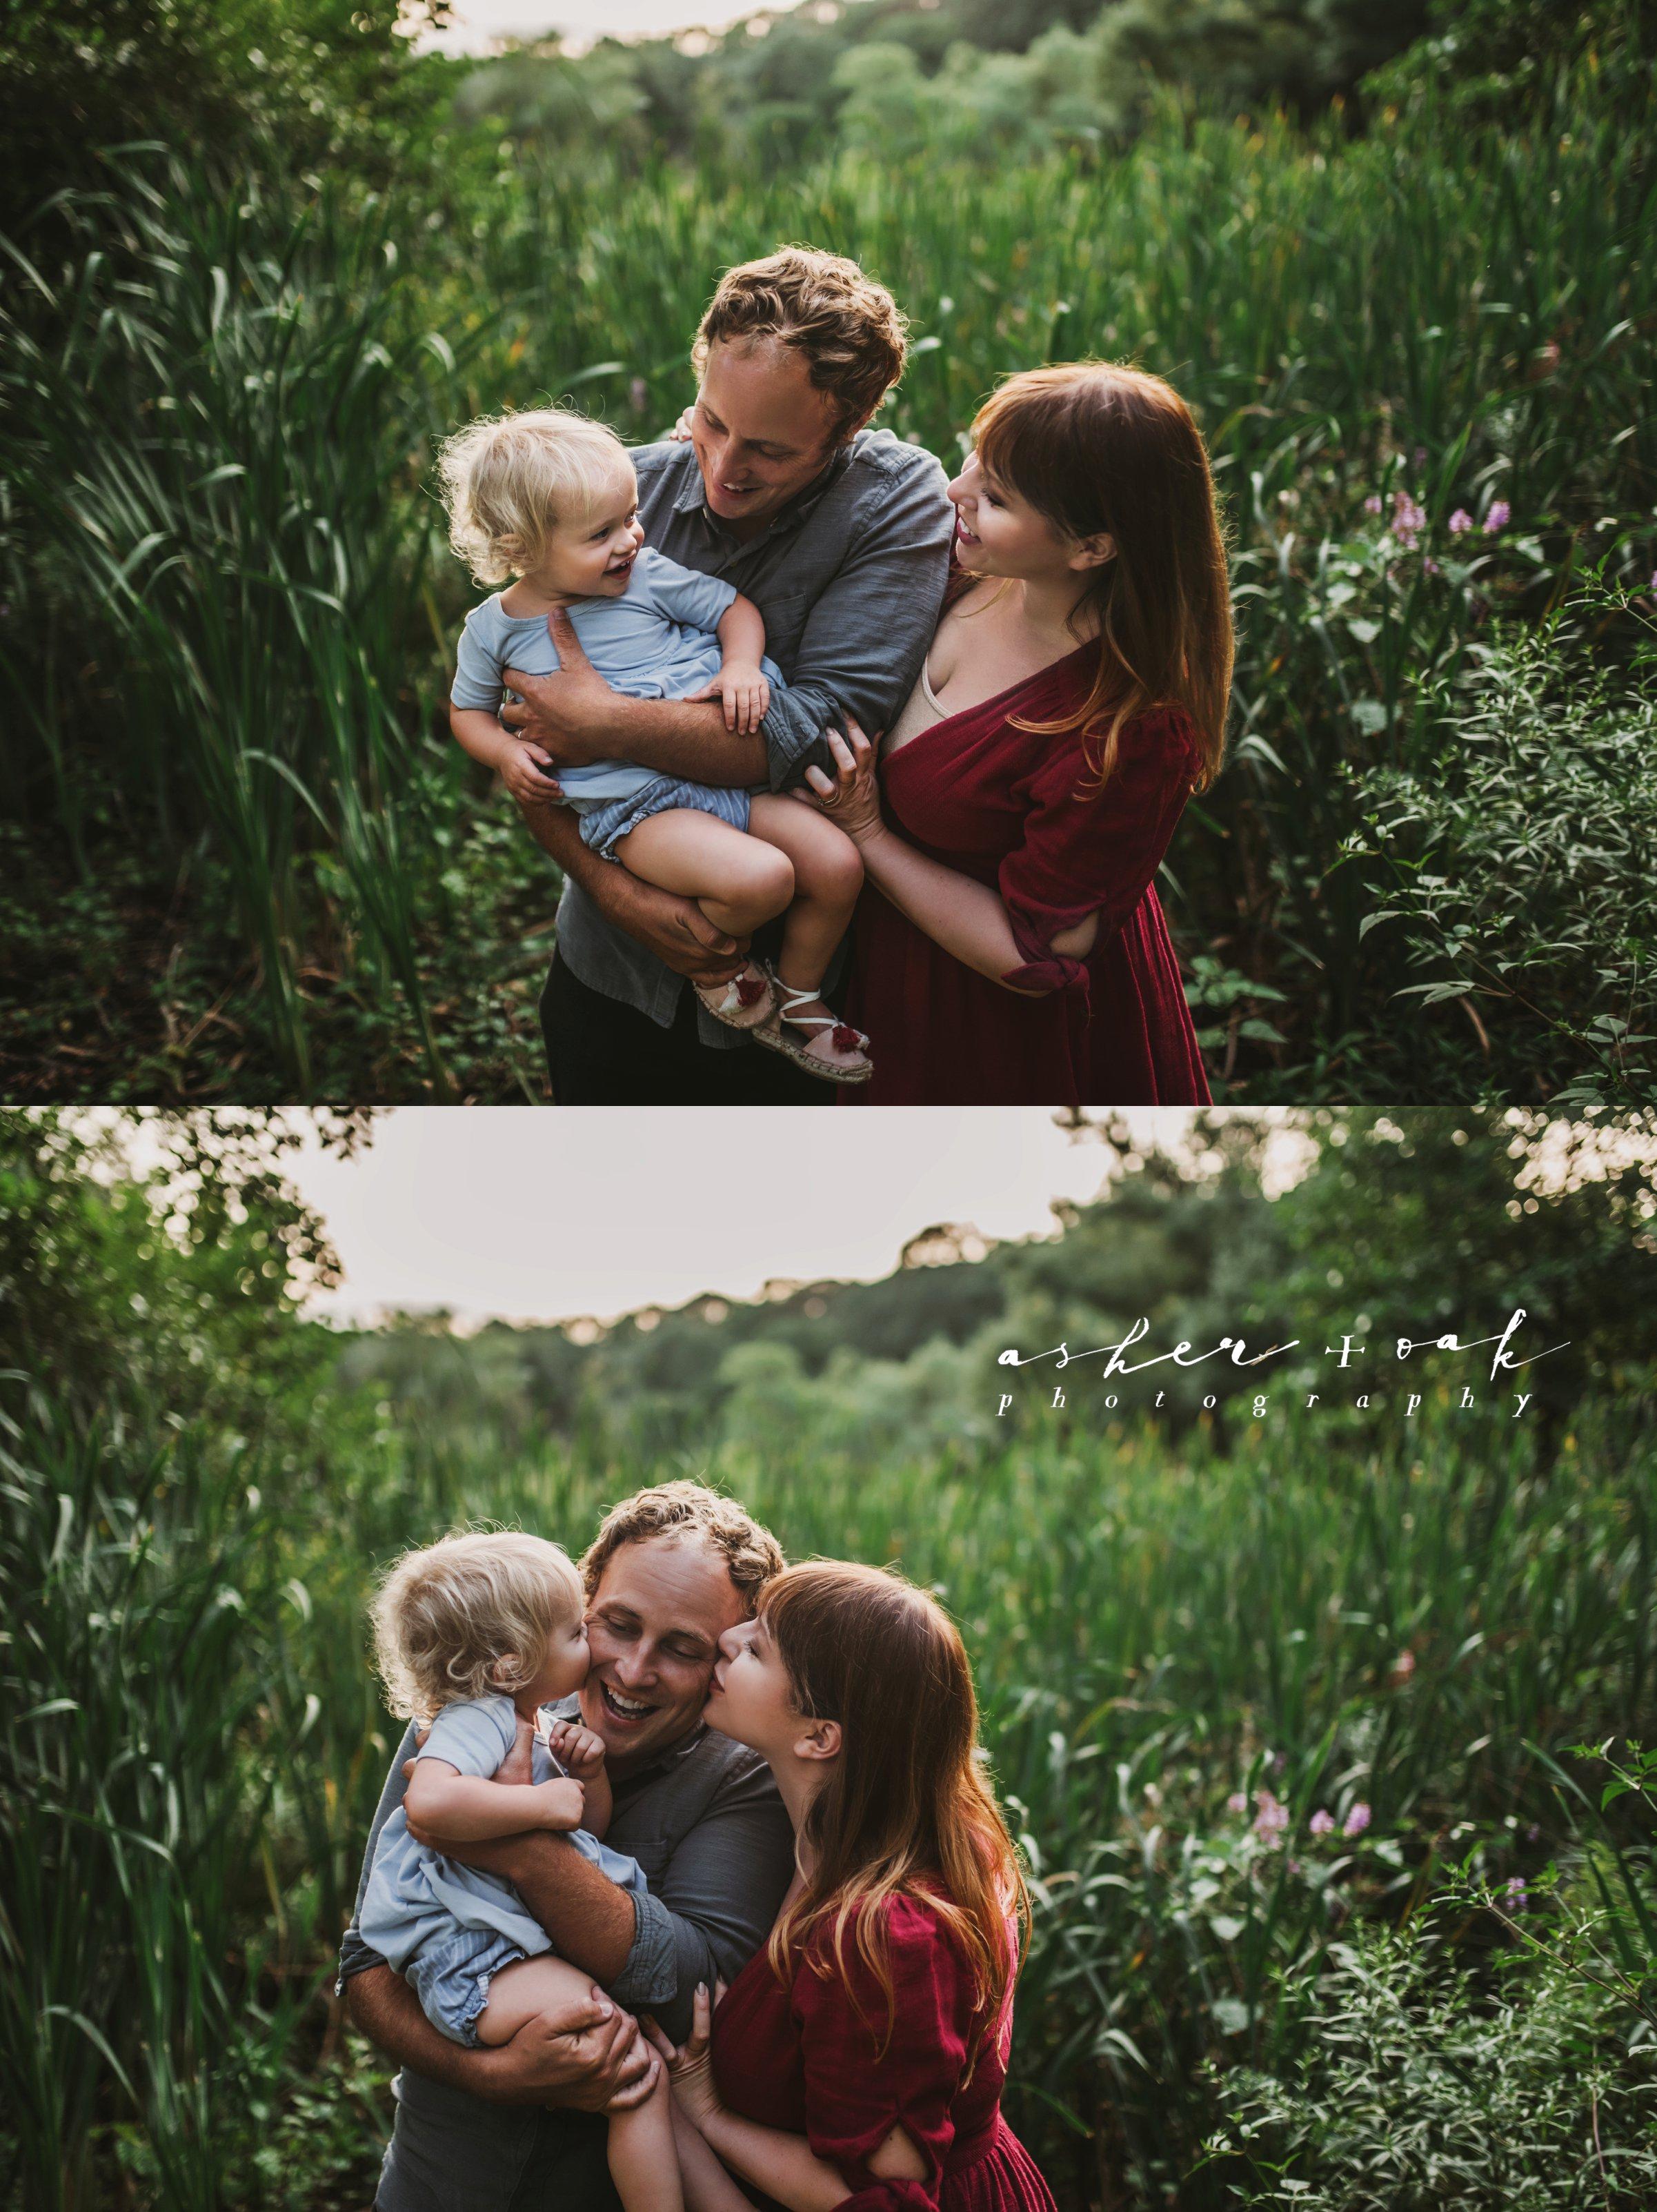 Massachusetts_Family_Photographer_Portrait_Dad_Mom_Toddler_Kiss_Beautiful_Arnold_Arboretum_Boston_Asher_and_Oak_Photography.jpg